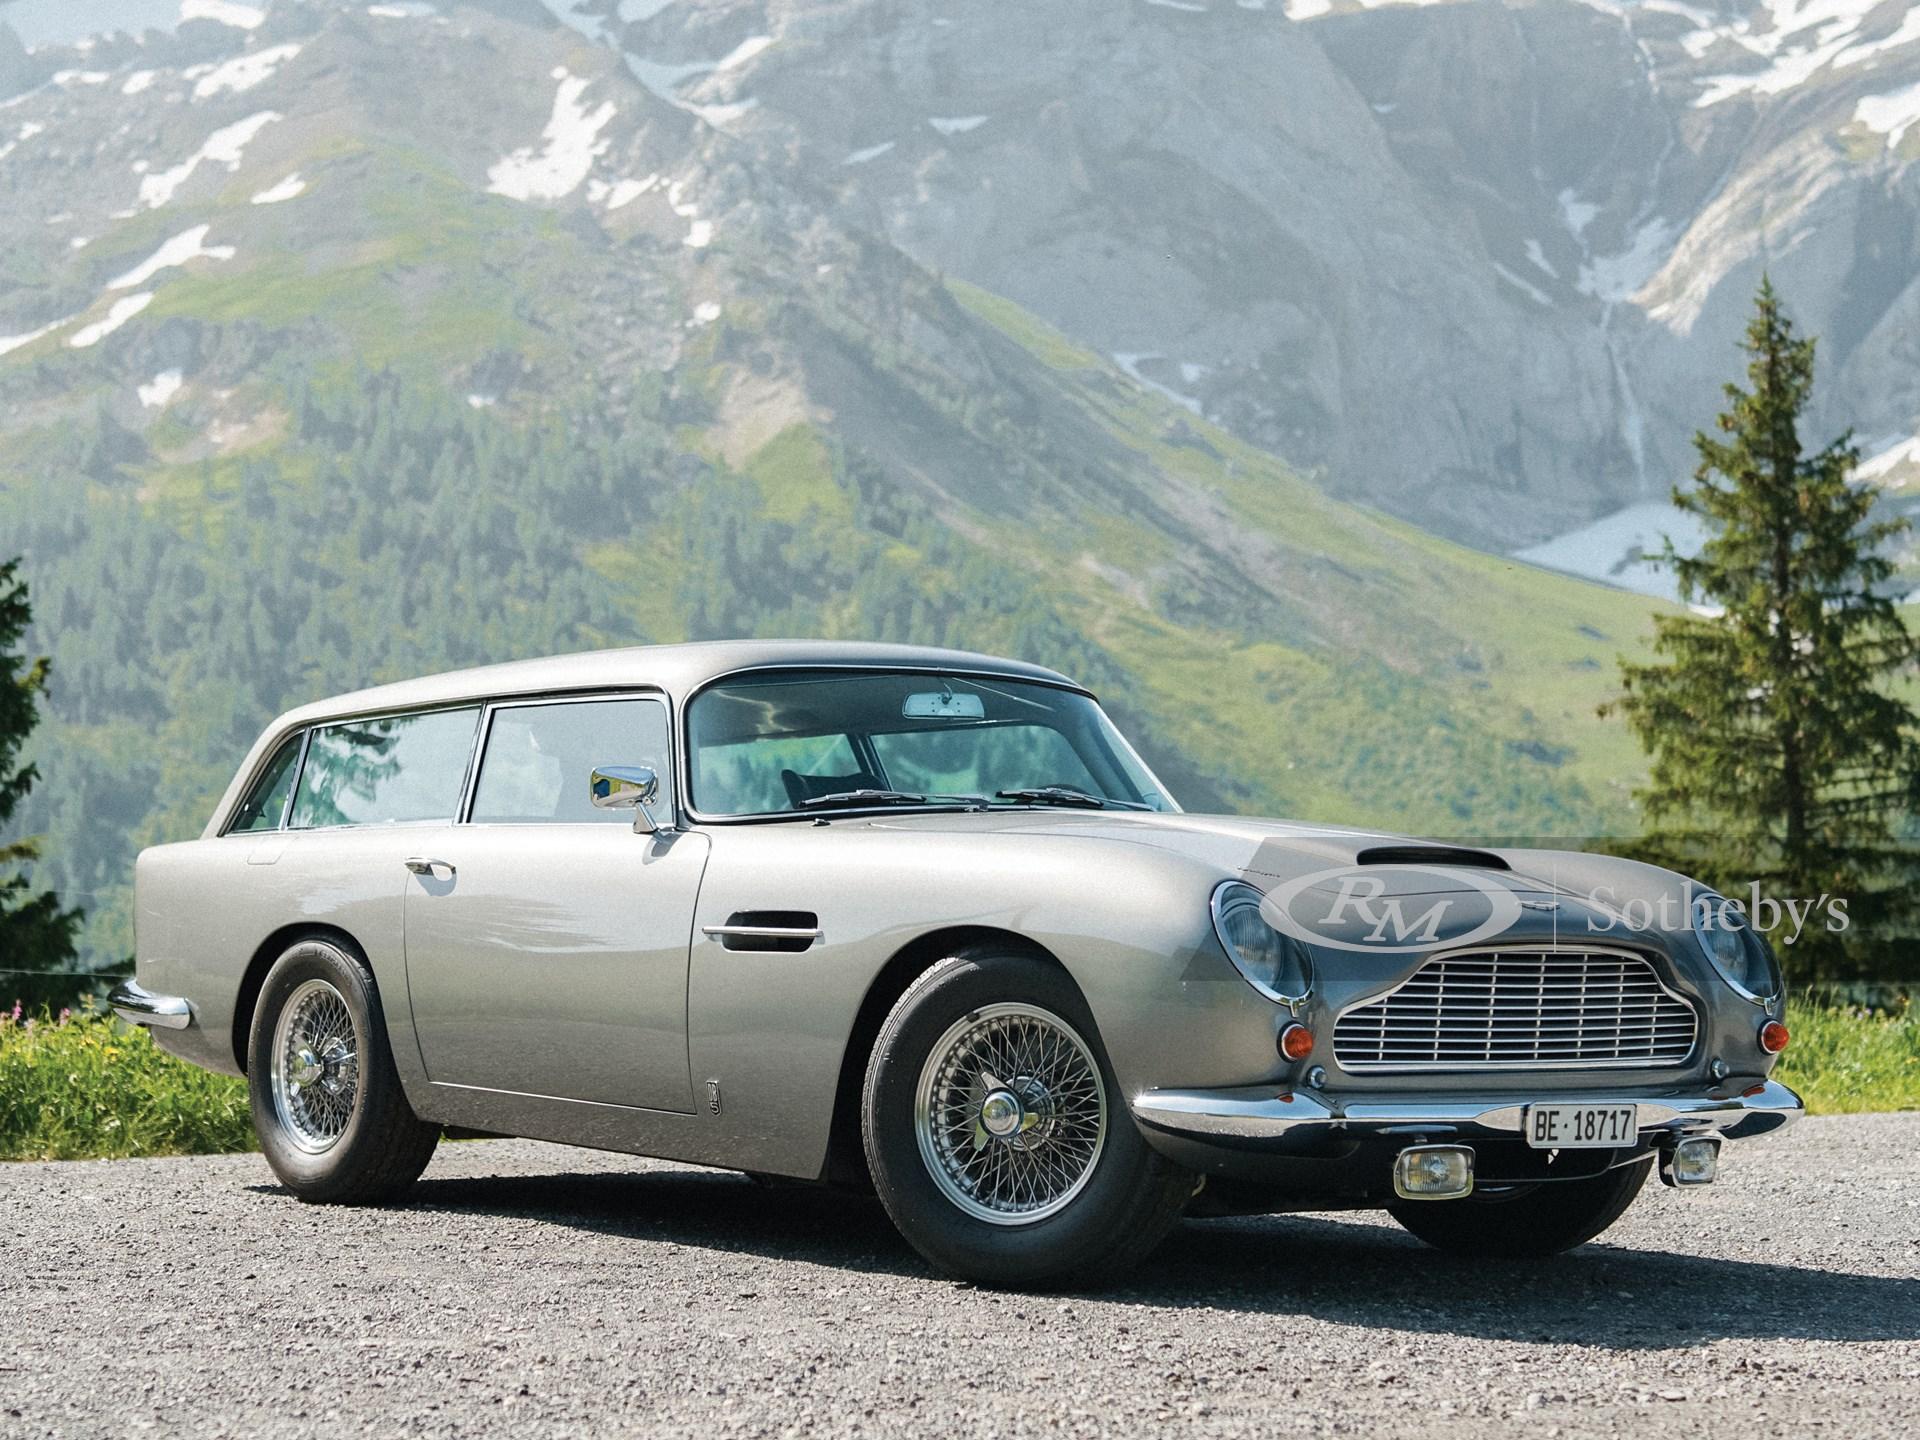 1965 Aston Martin Db5 Shooting Brake By Radford Monterey 2019 Rm Sotheby S